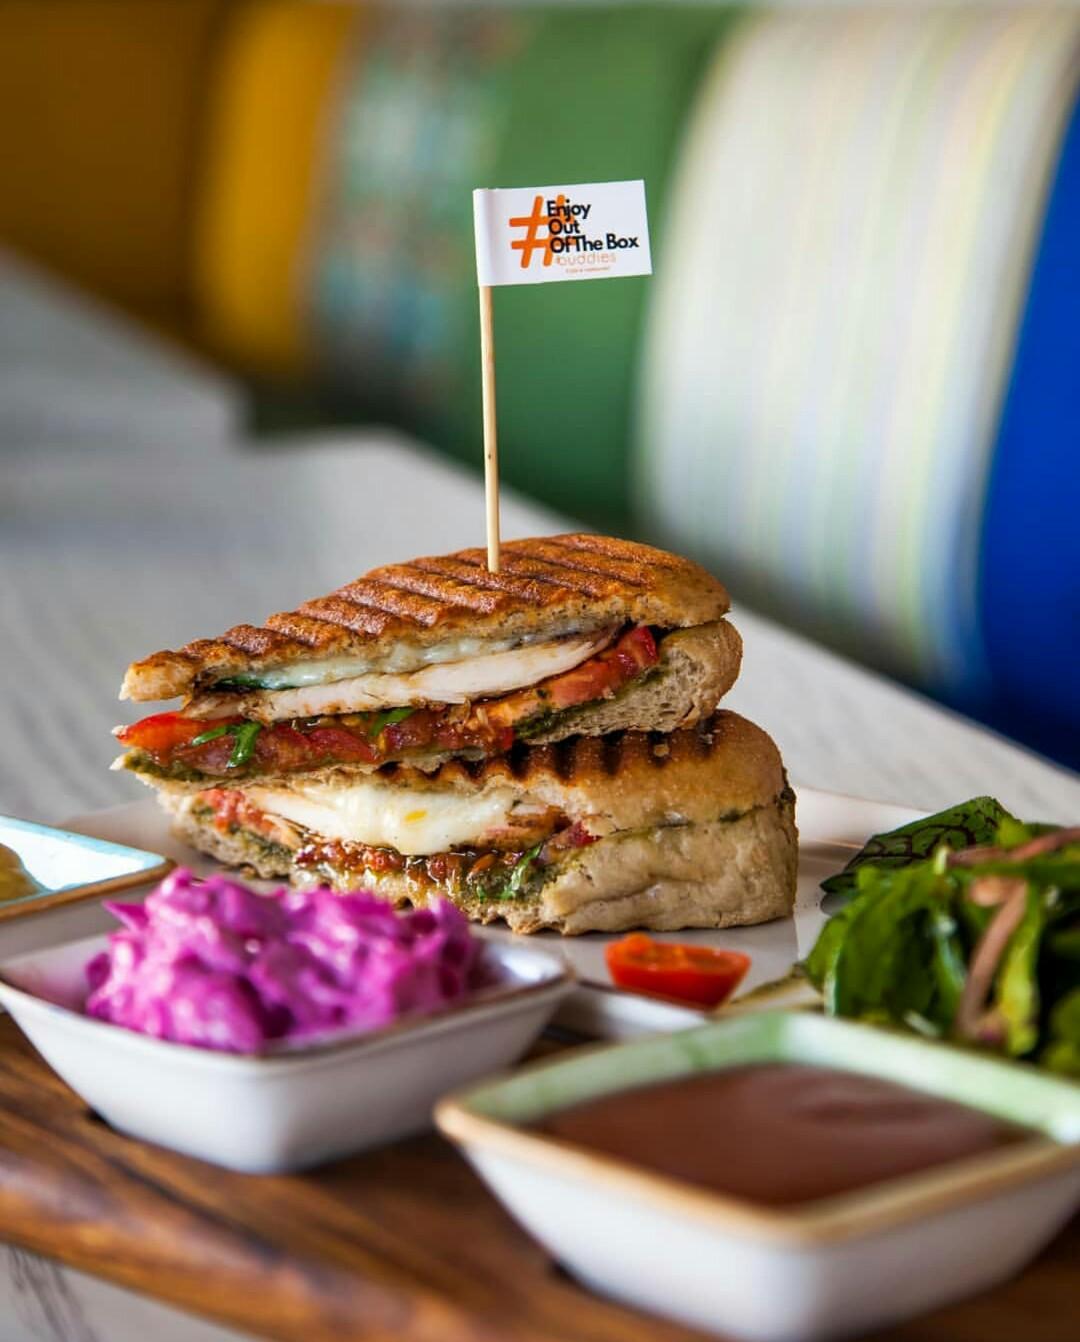 کافه و رستوران بادیز - پنینی مرغ گریل با سس پستو